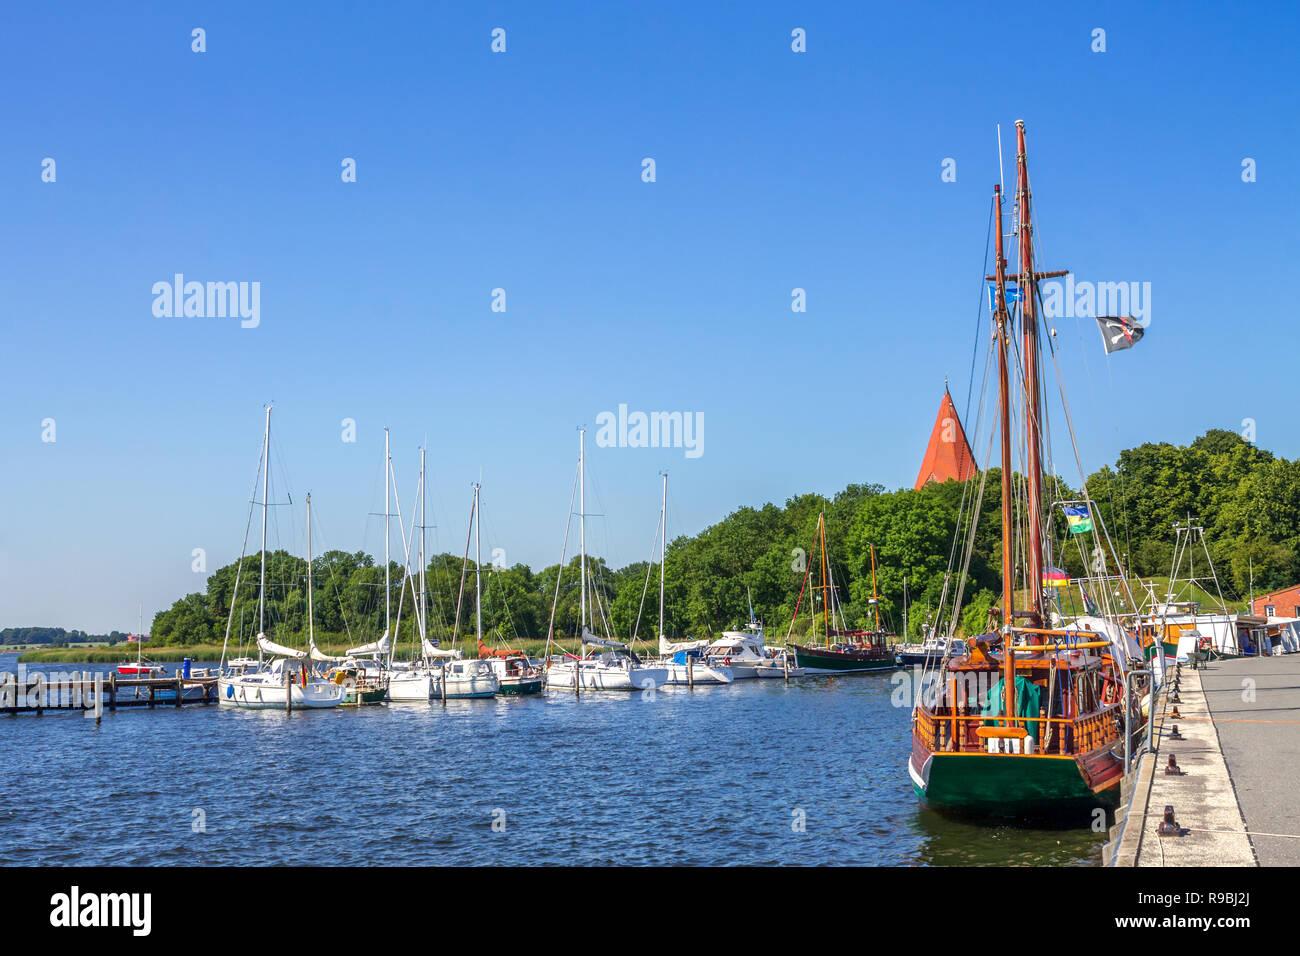 Marina, Island Poel, Germany - Stock Image